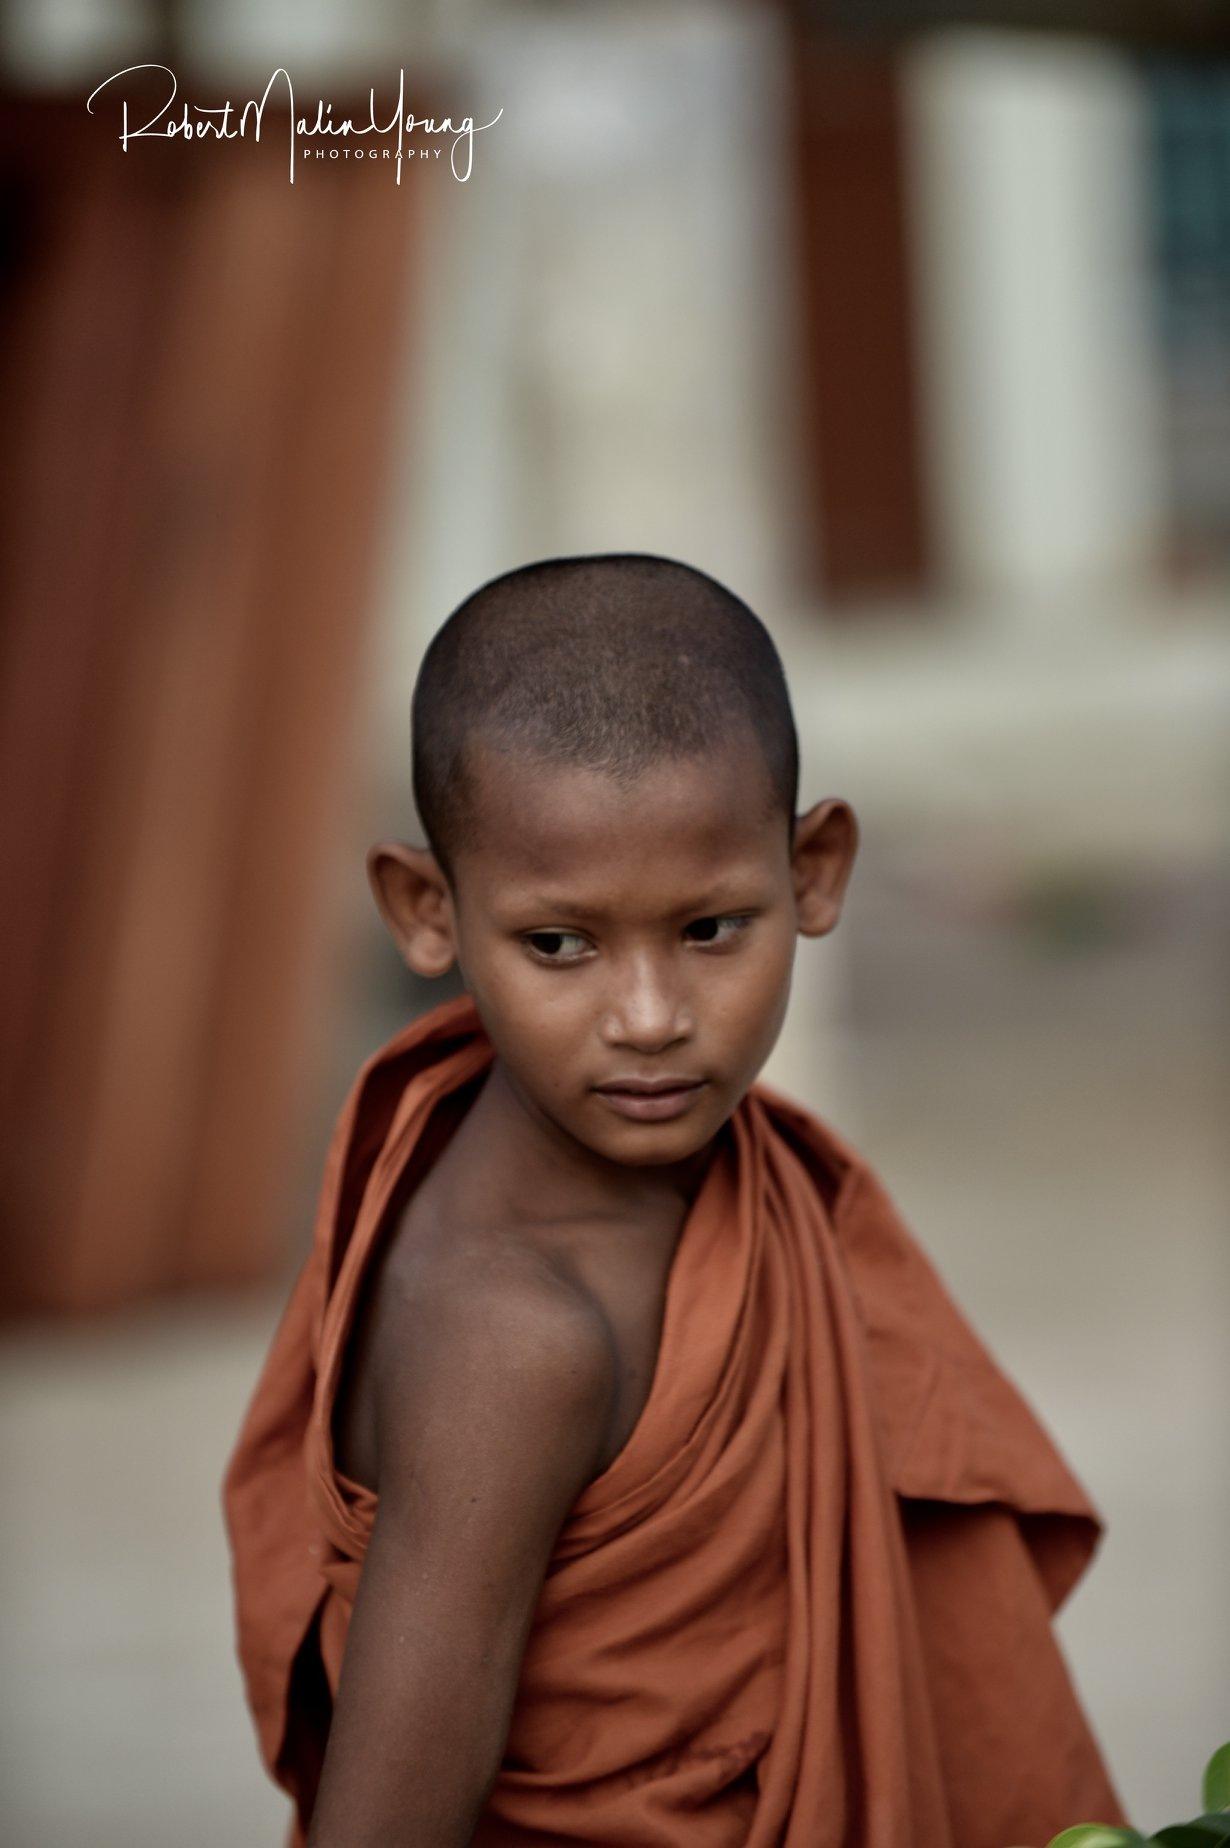 Young Monk - Laos 2018 by Robert Malin Young